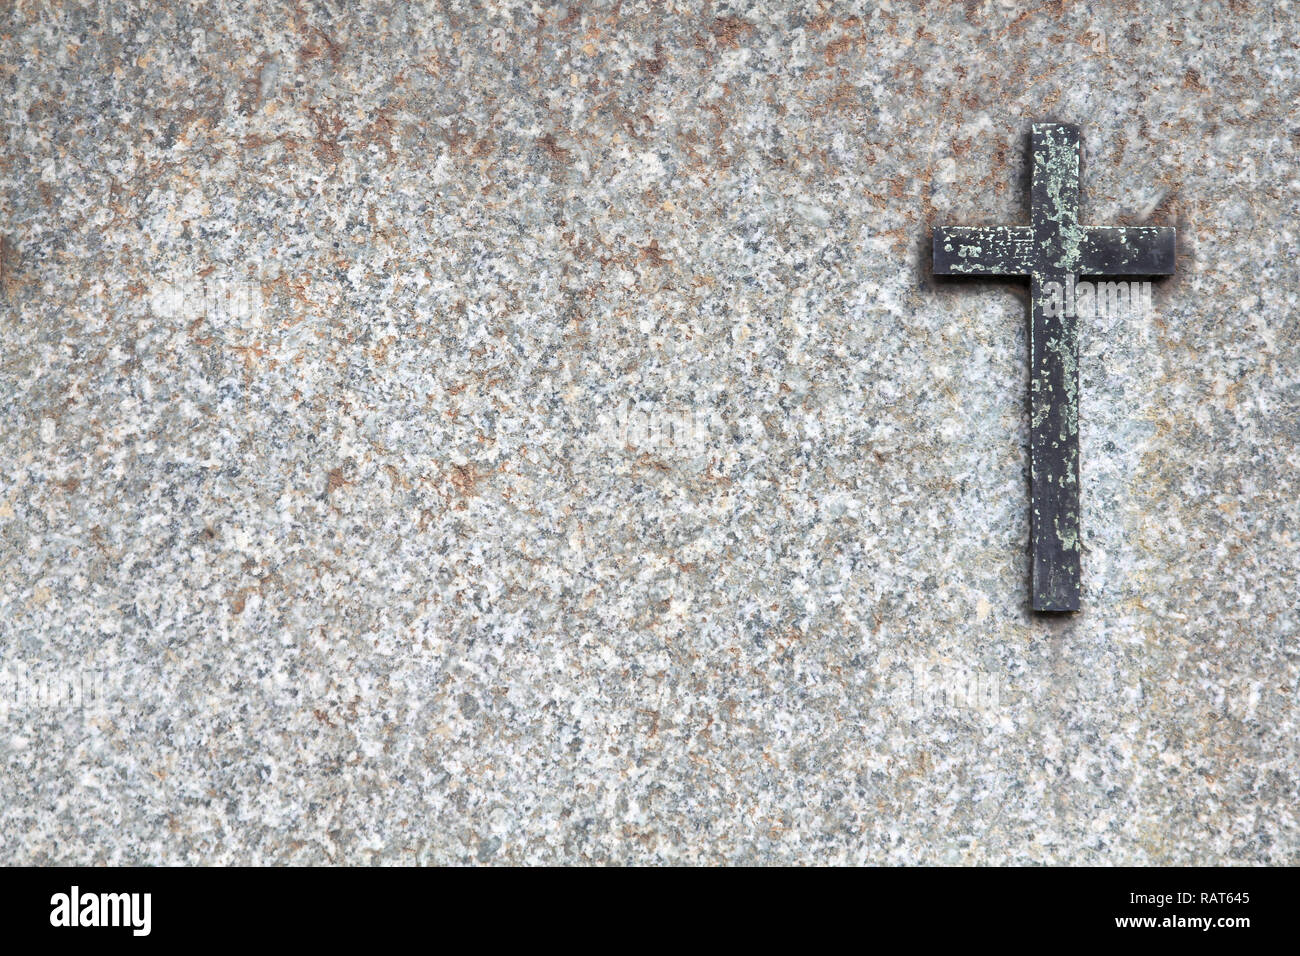 Gravestone texture - granite stone and a brass cross. Religious background. - Stock Image